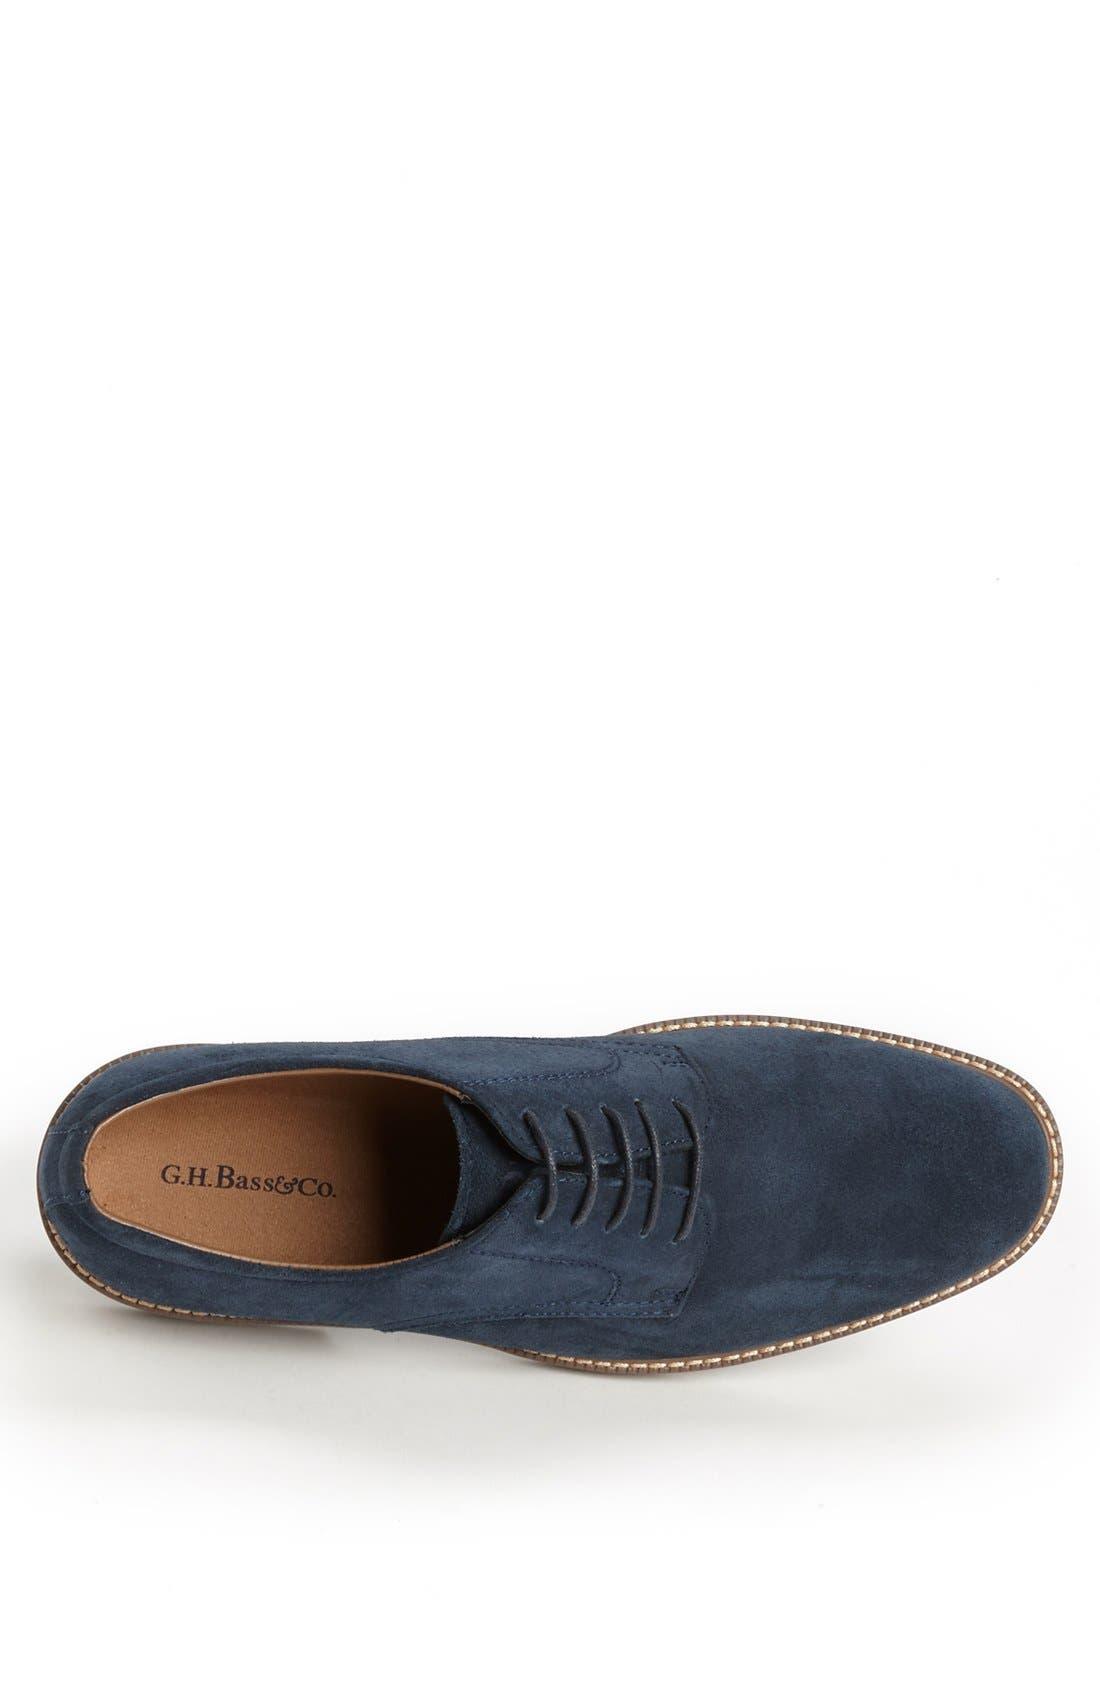 Alternate Image 3  - G.H. Bass and Co. 'Pasadena' Buck Shoe